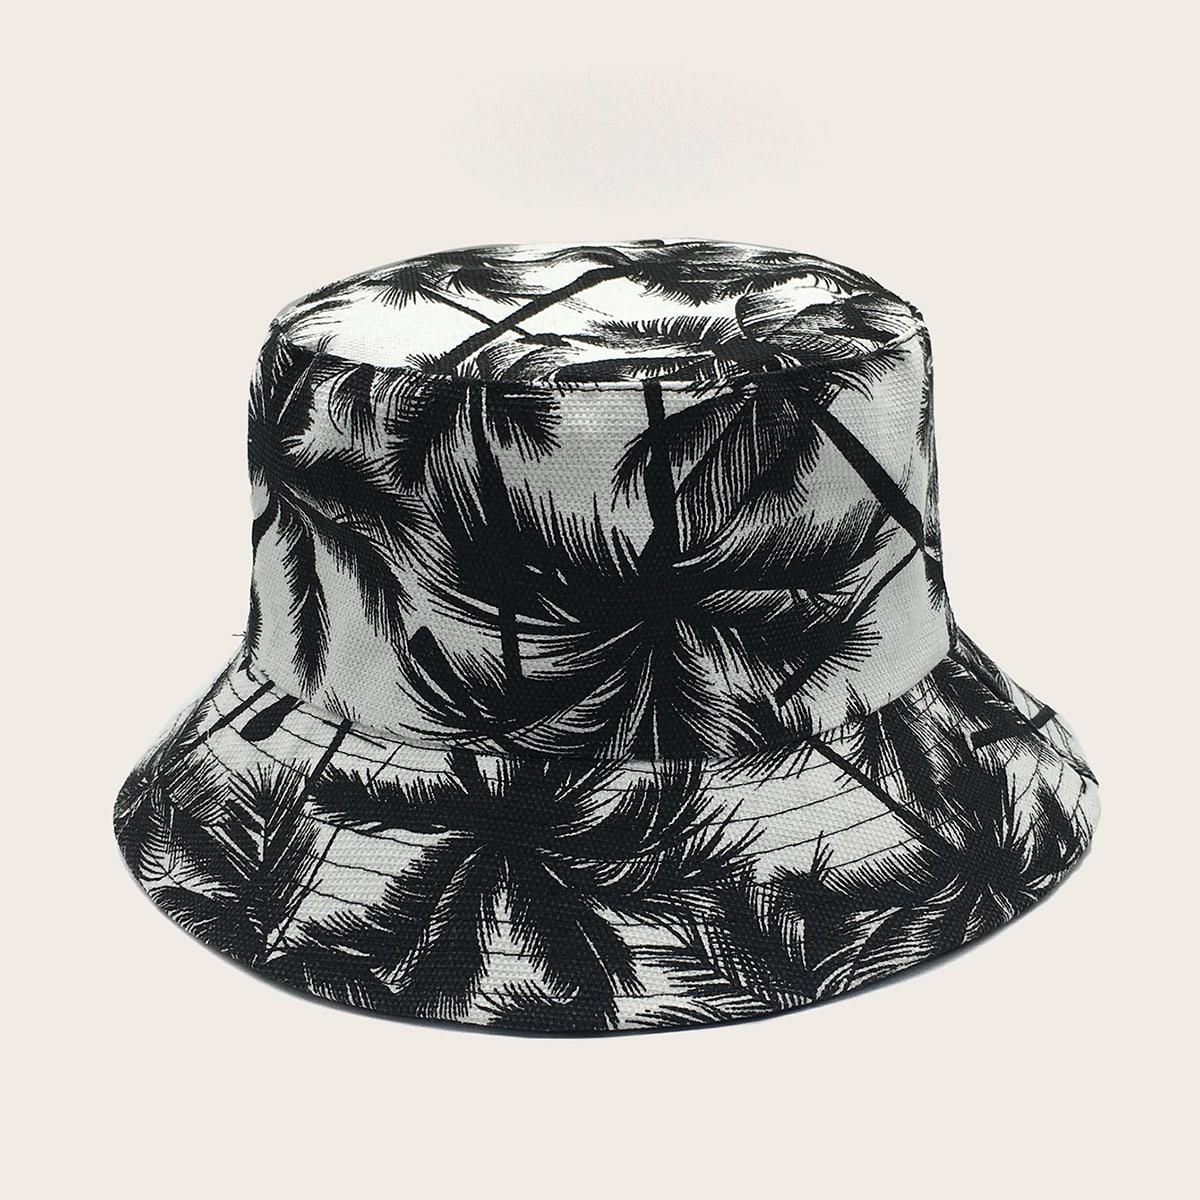 Мужская шапка с пряжкой от SHEIN